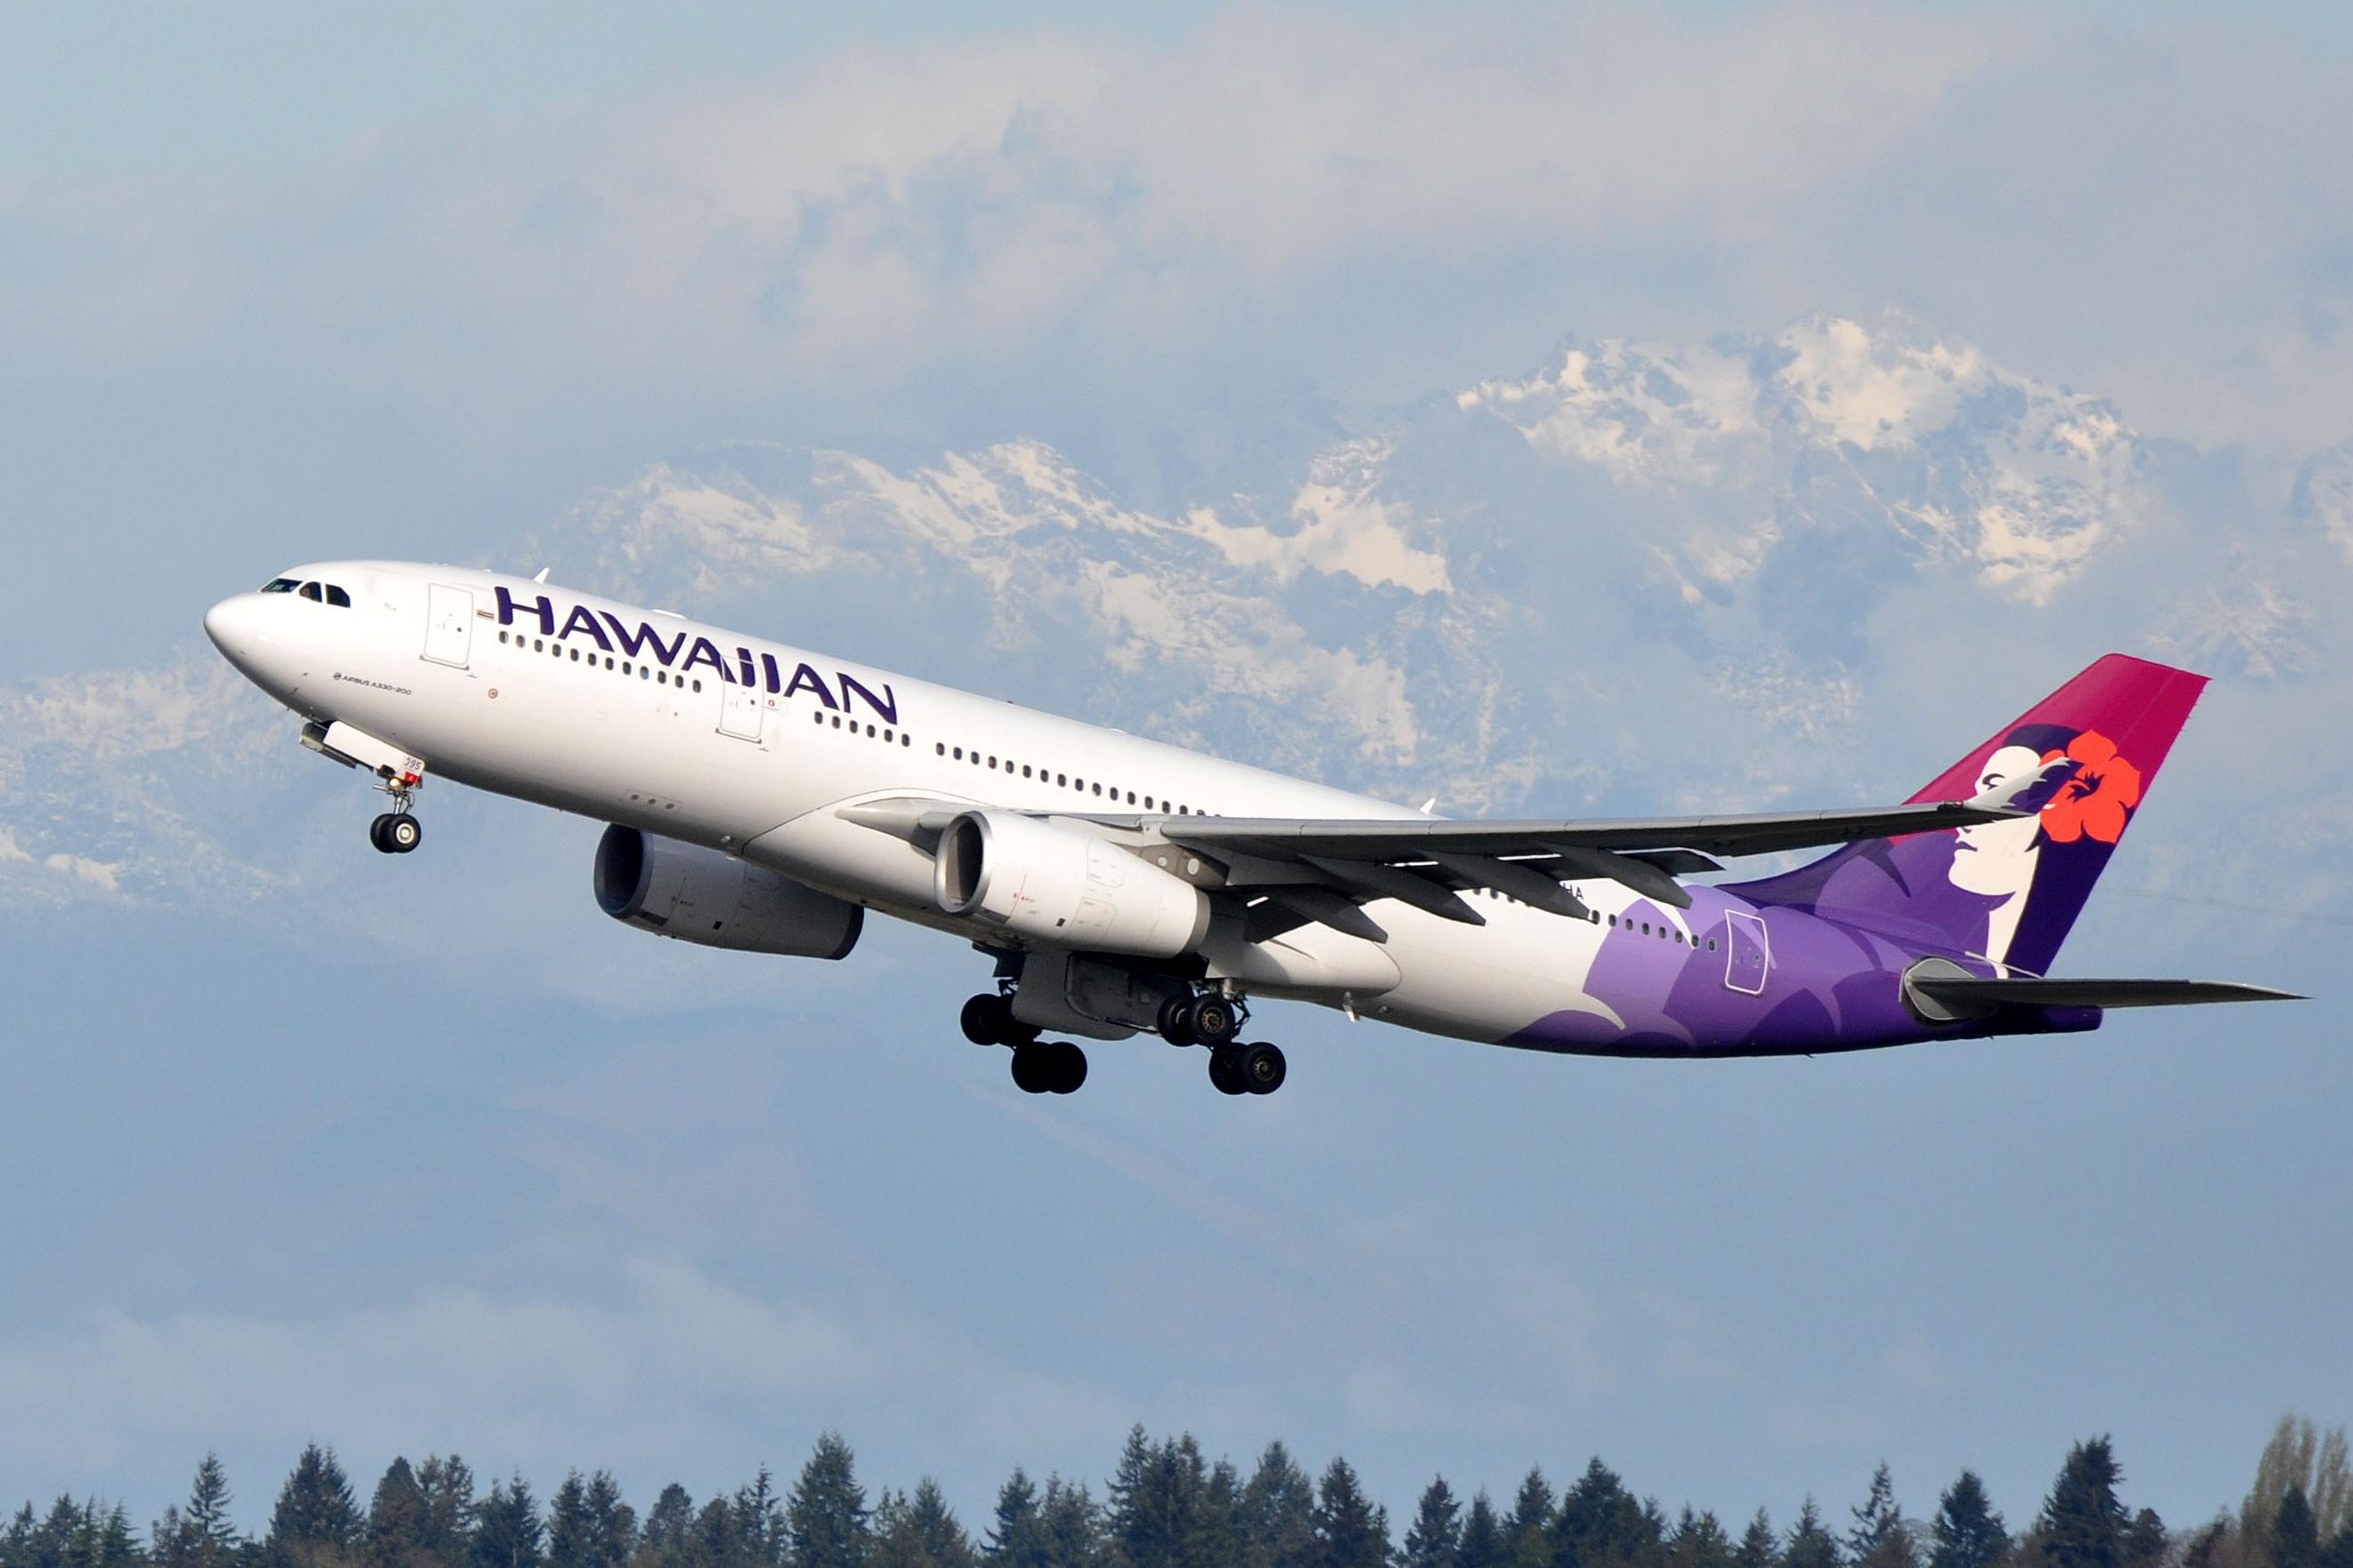 Fichier:Hawaiian Airlines, Airbus A330-243, N395HA - SEA ...